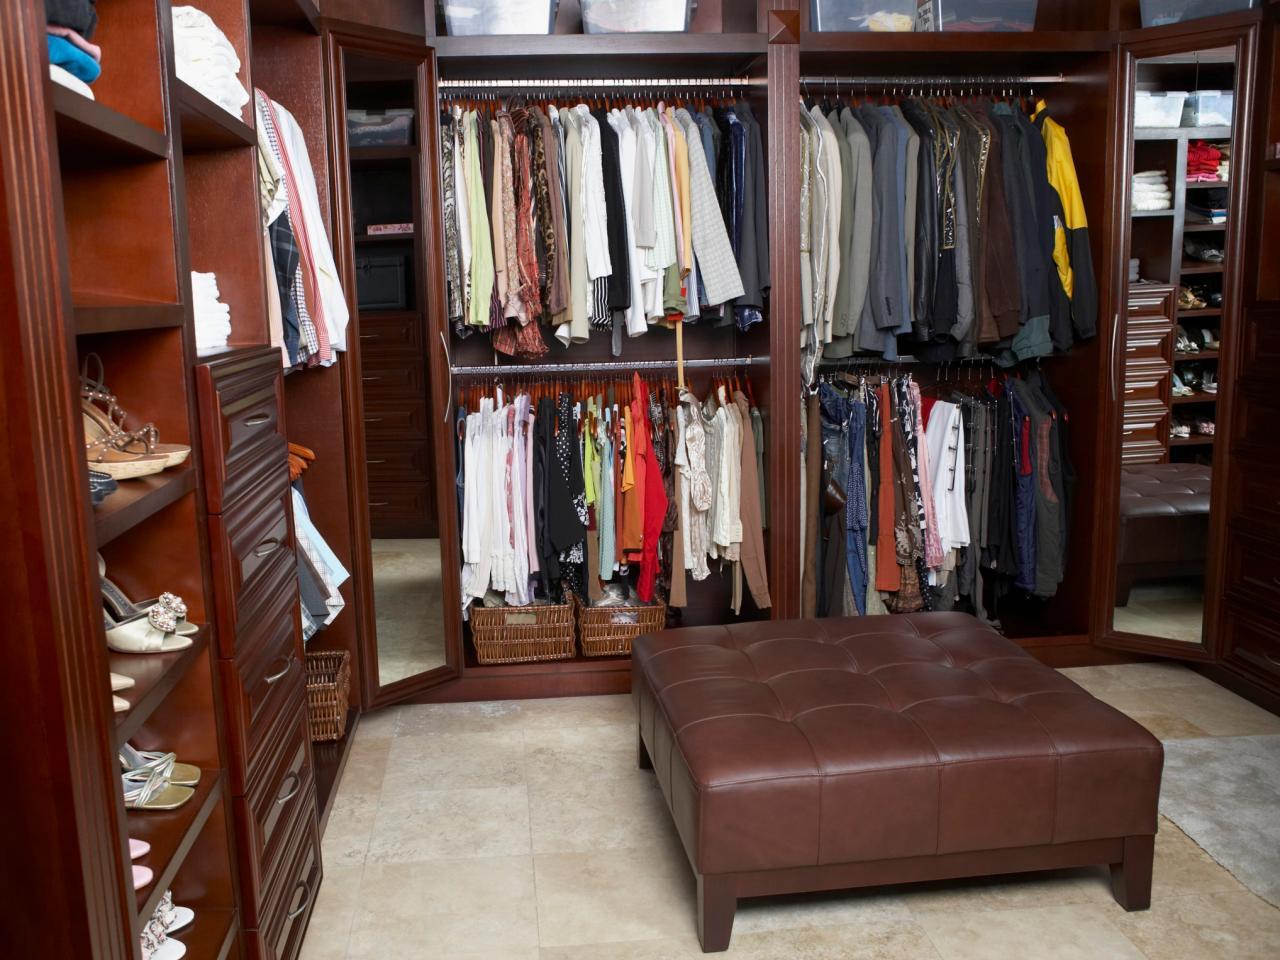 Walk-in sovrum garderob